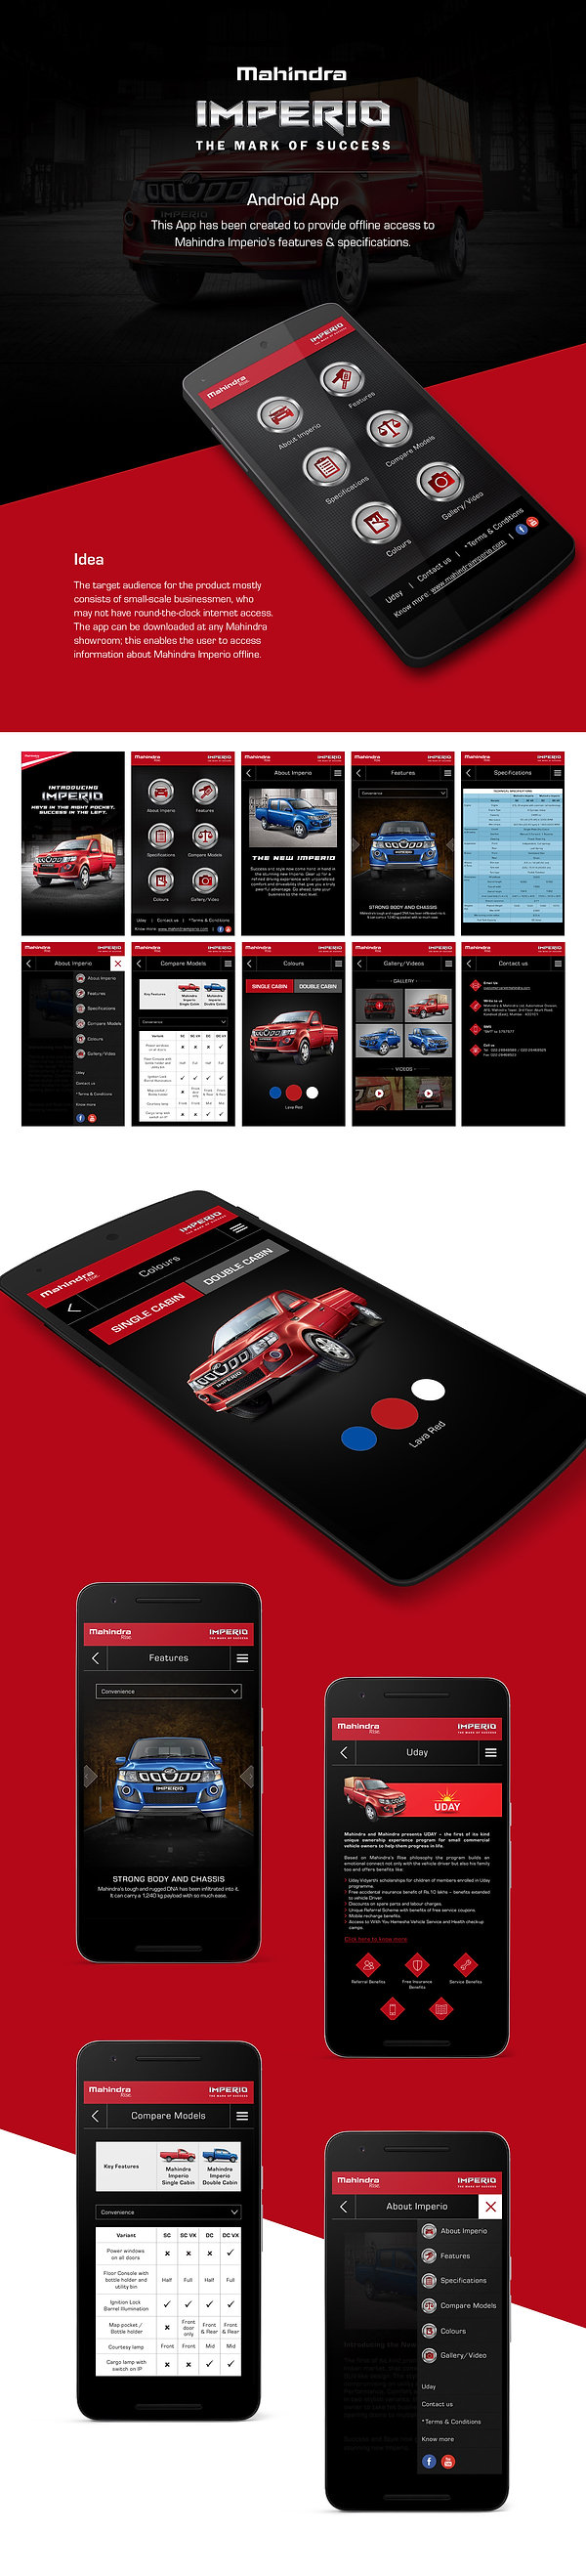 U220_App_Presentation.jpg